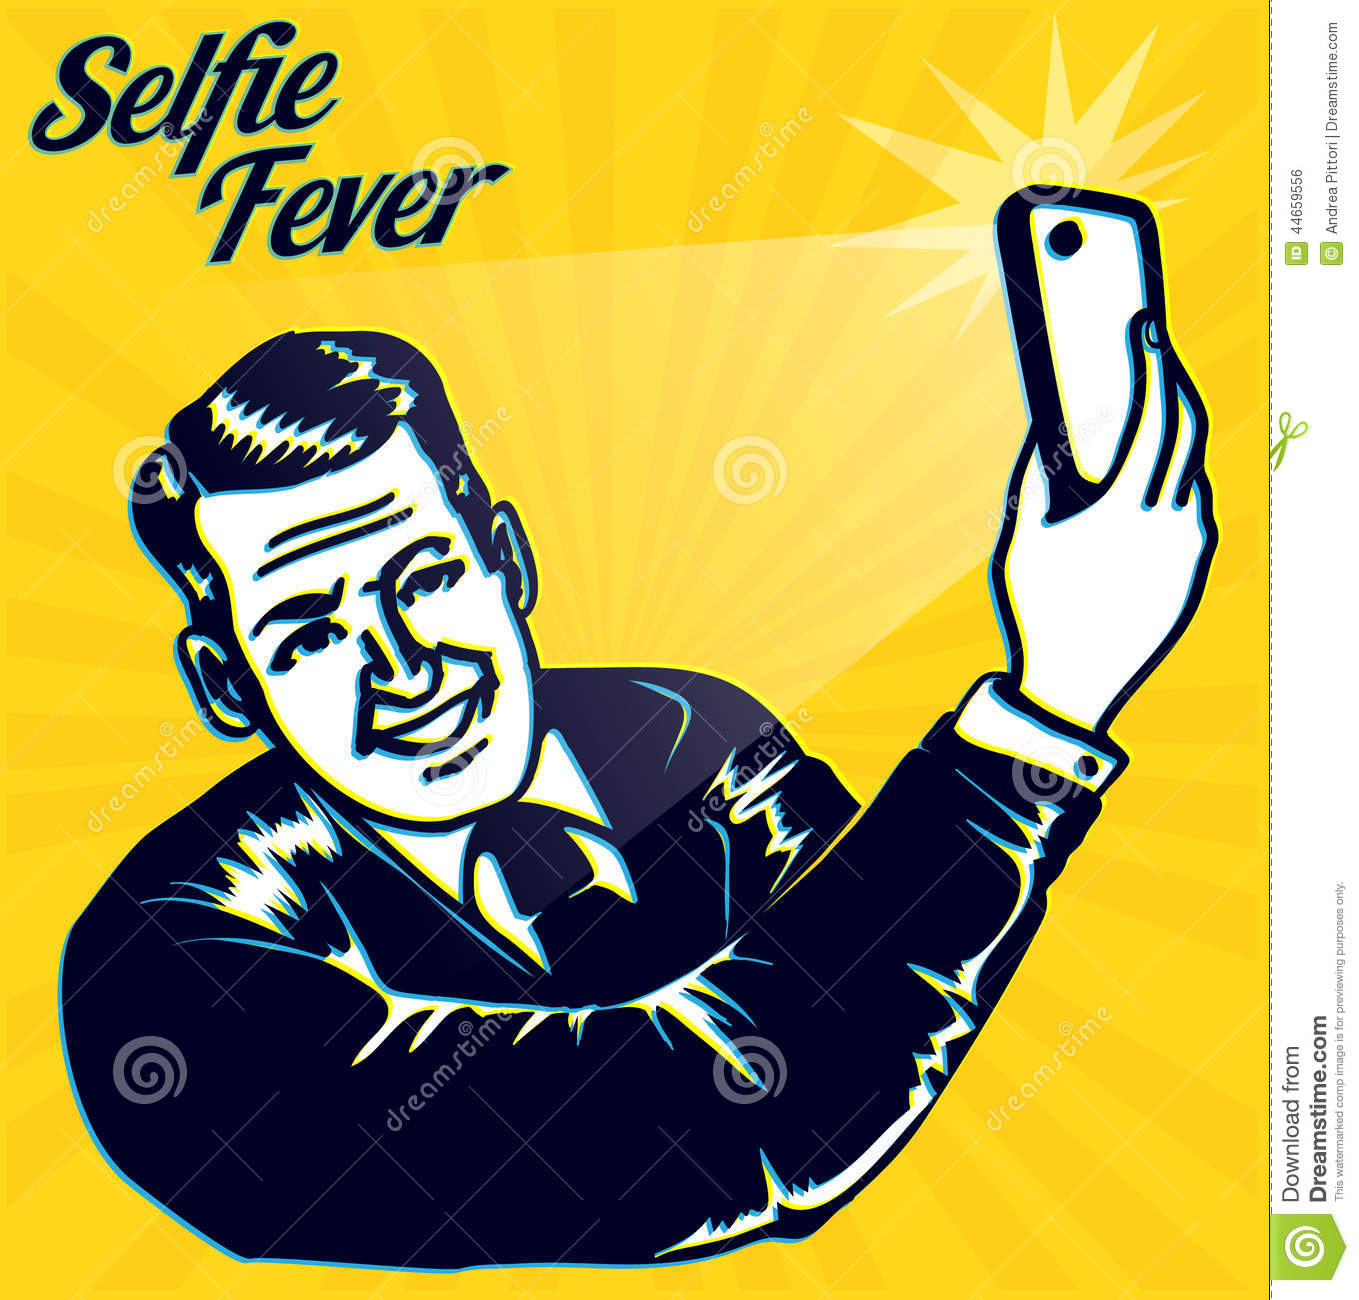 Selfie clipart #9, Download drawings